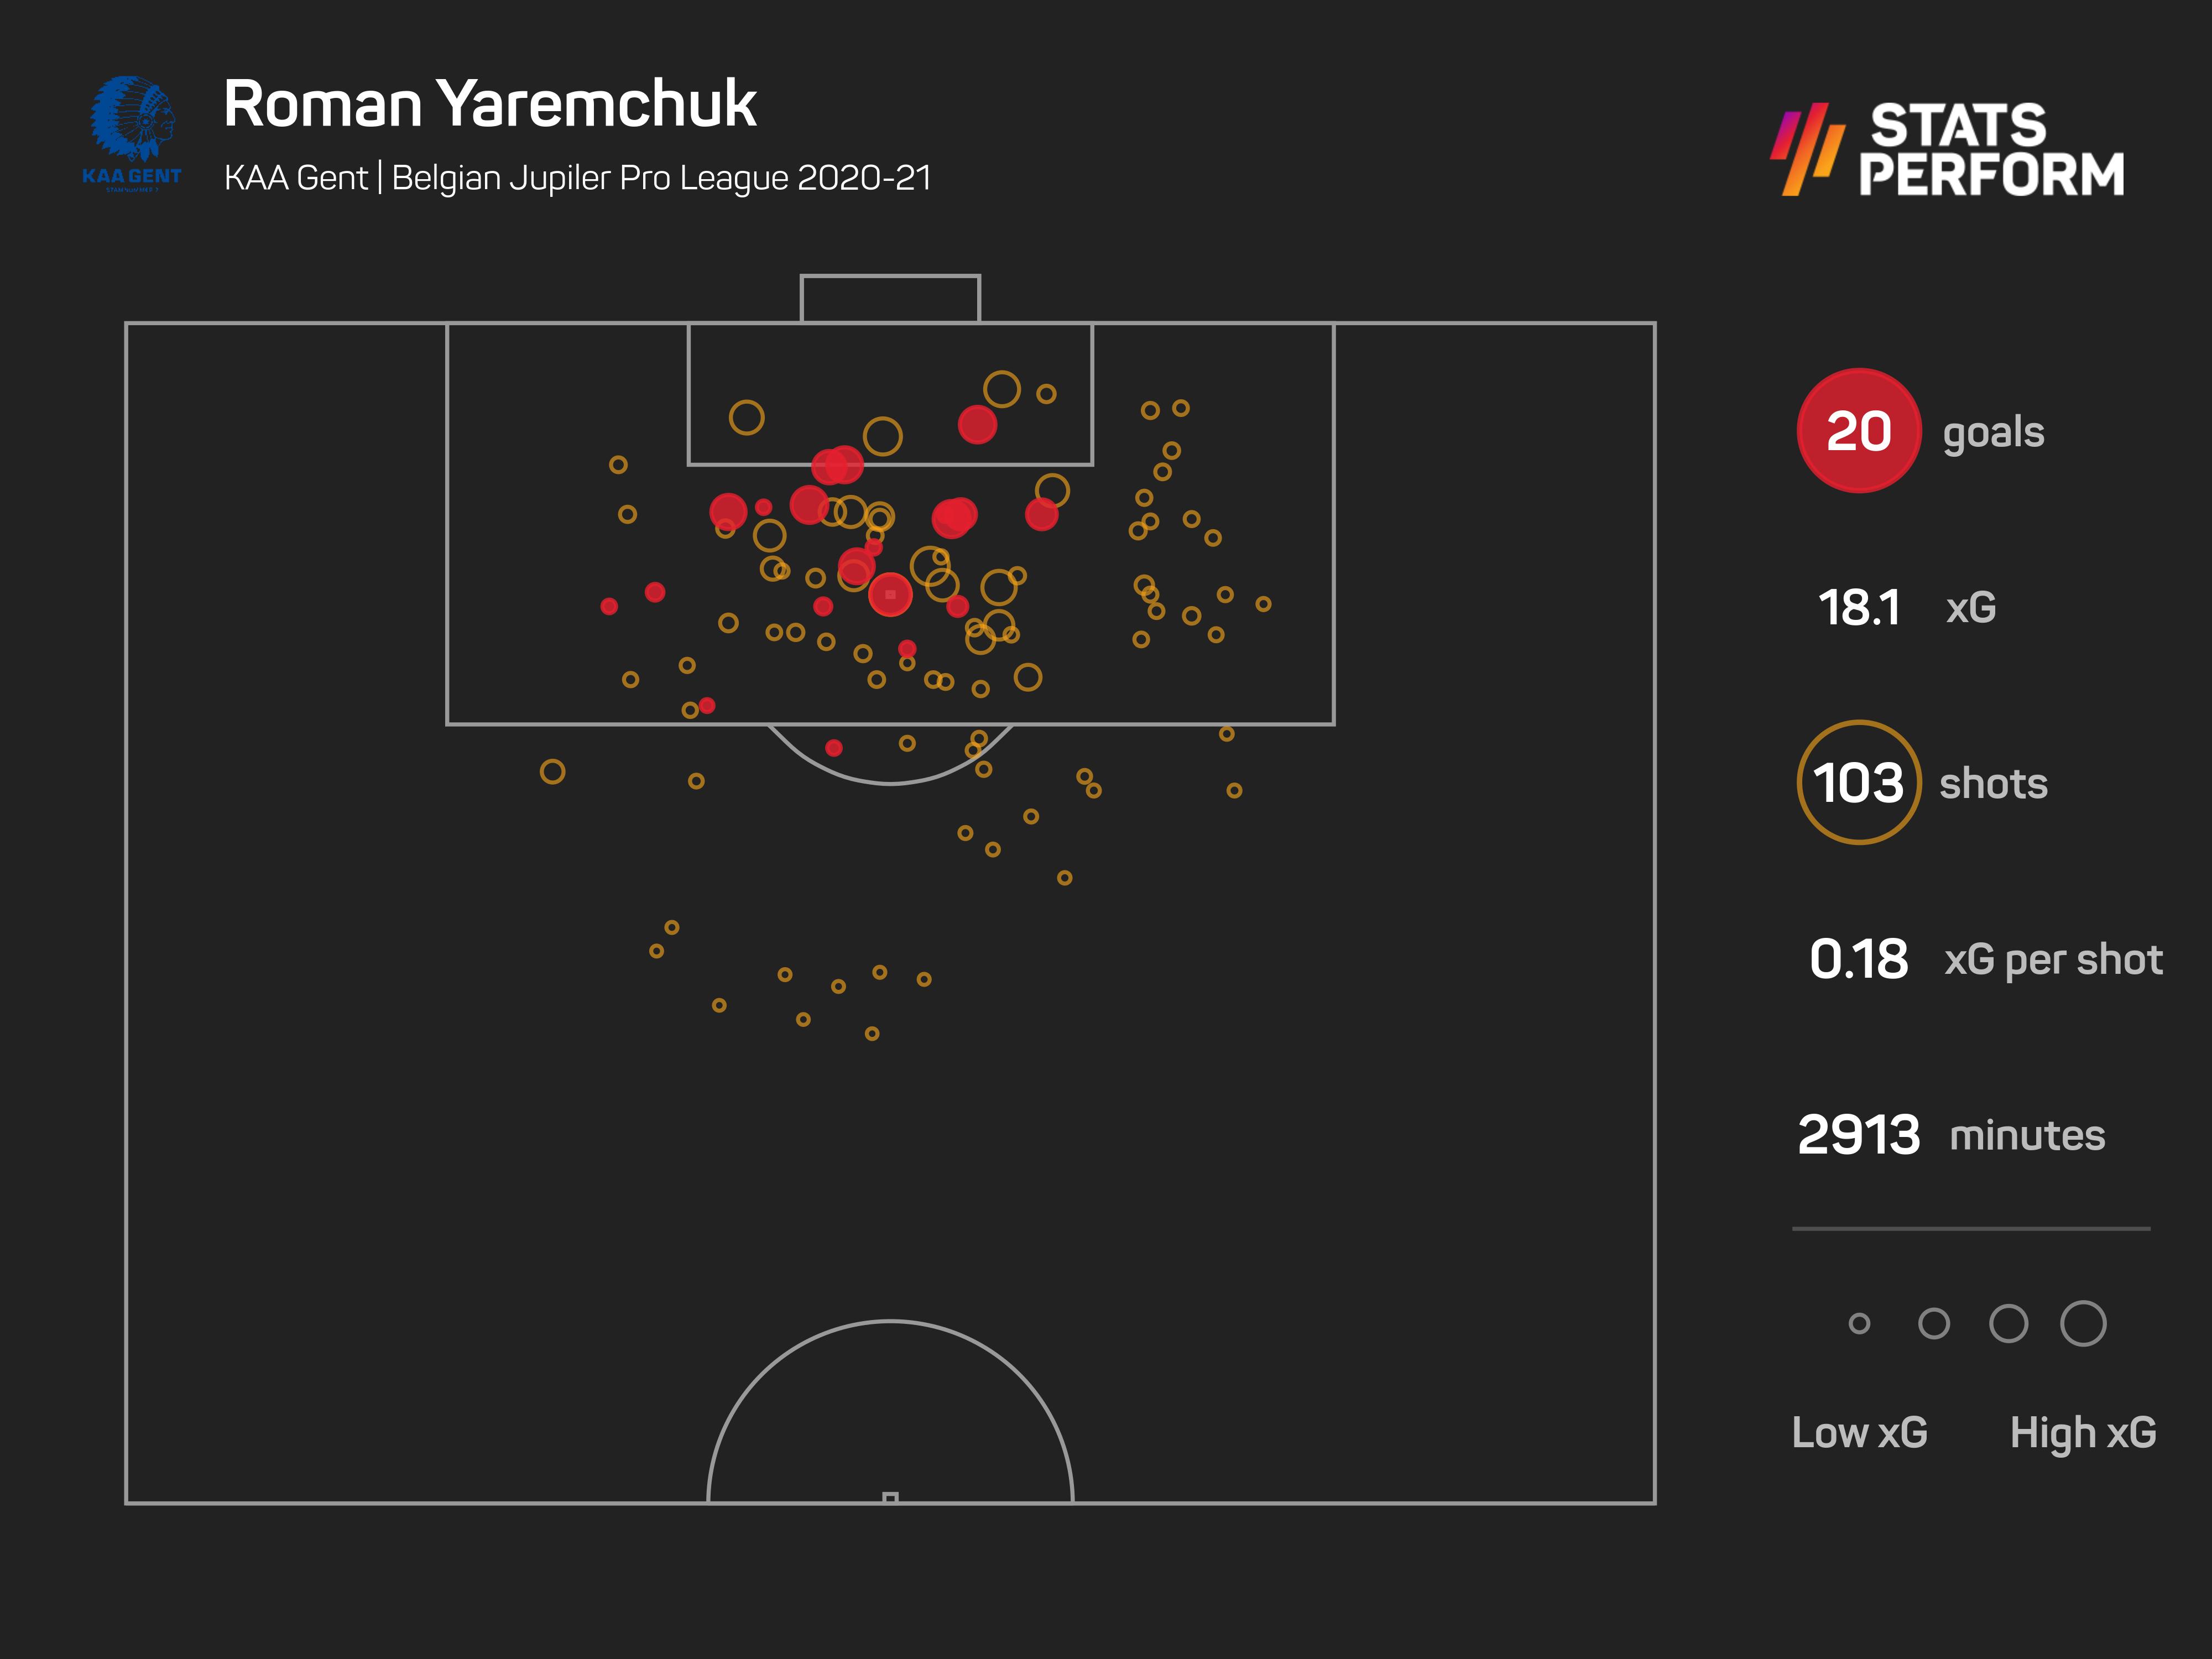 Roman Yaremchuk enjoyed his most fruitful season in front of goal in 2020-21